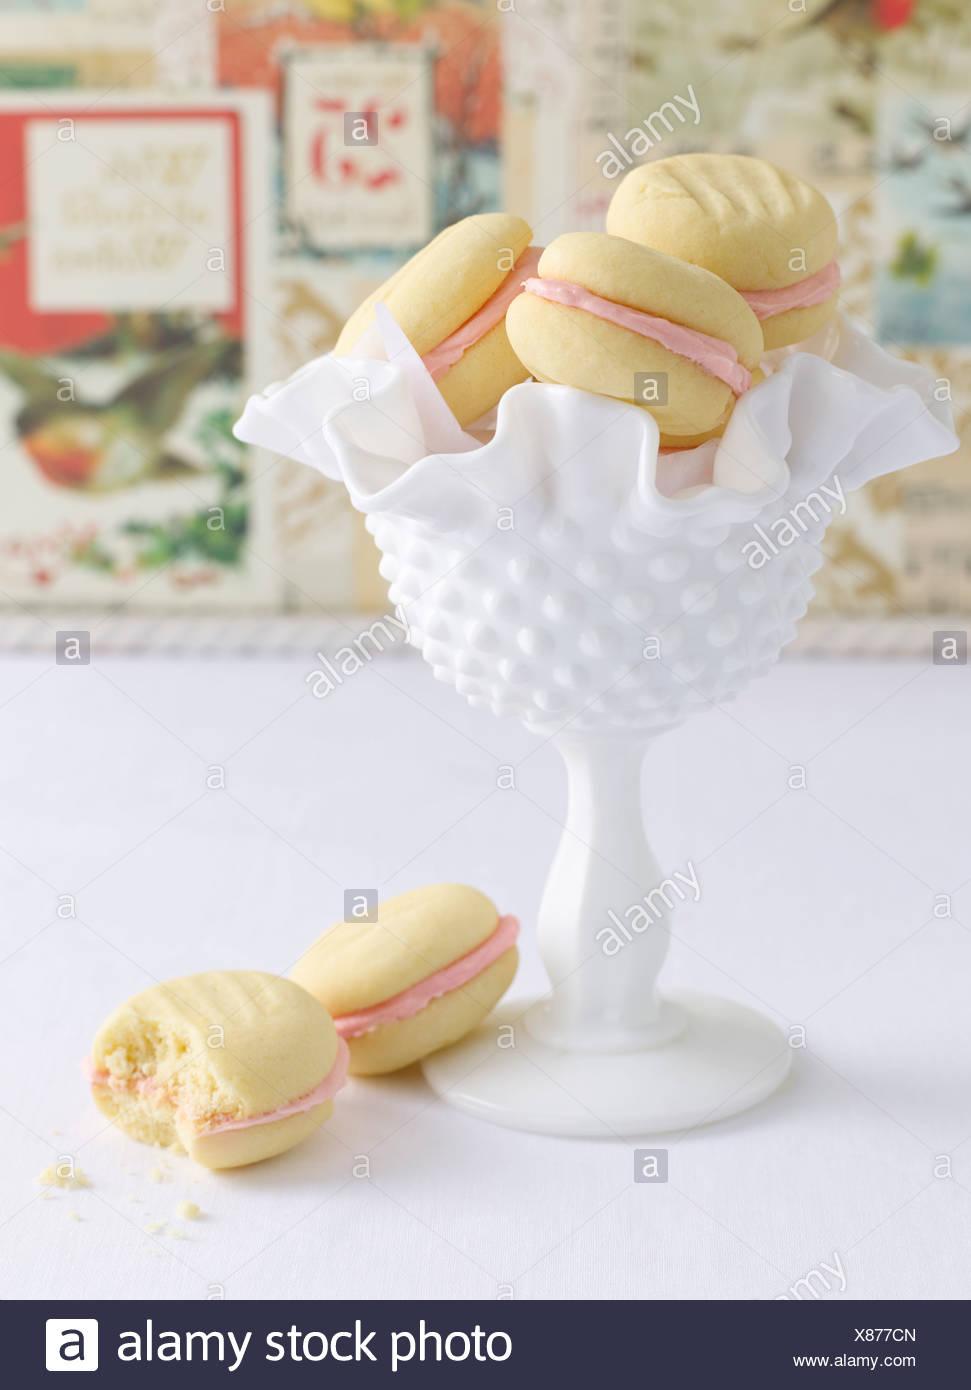 Bowl of macaroon cookies - Stock Image